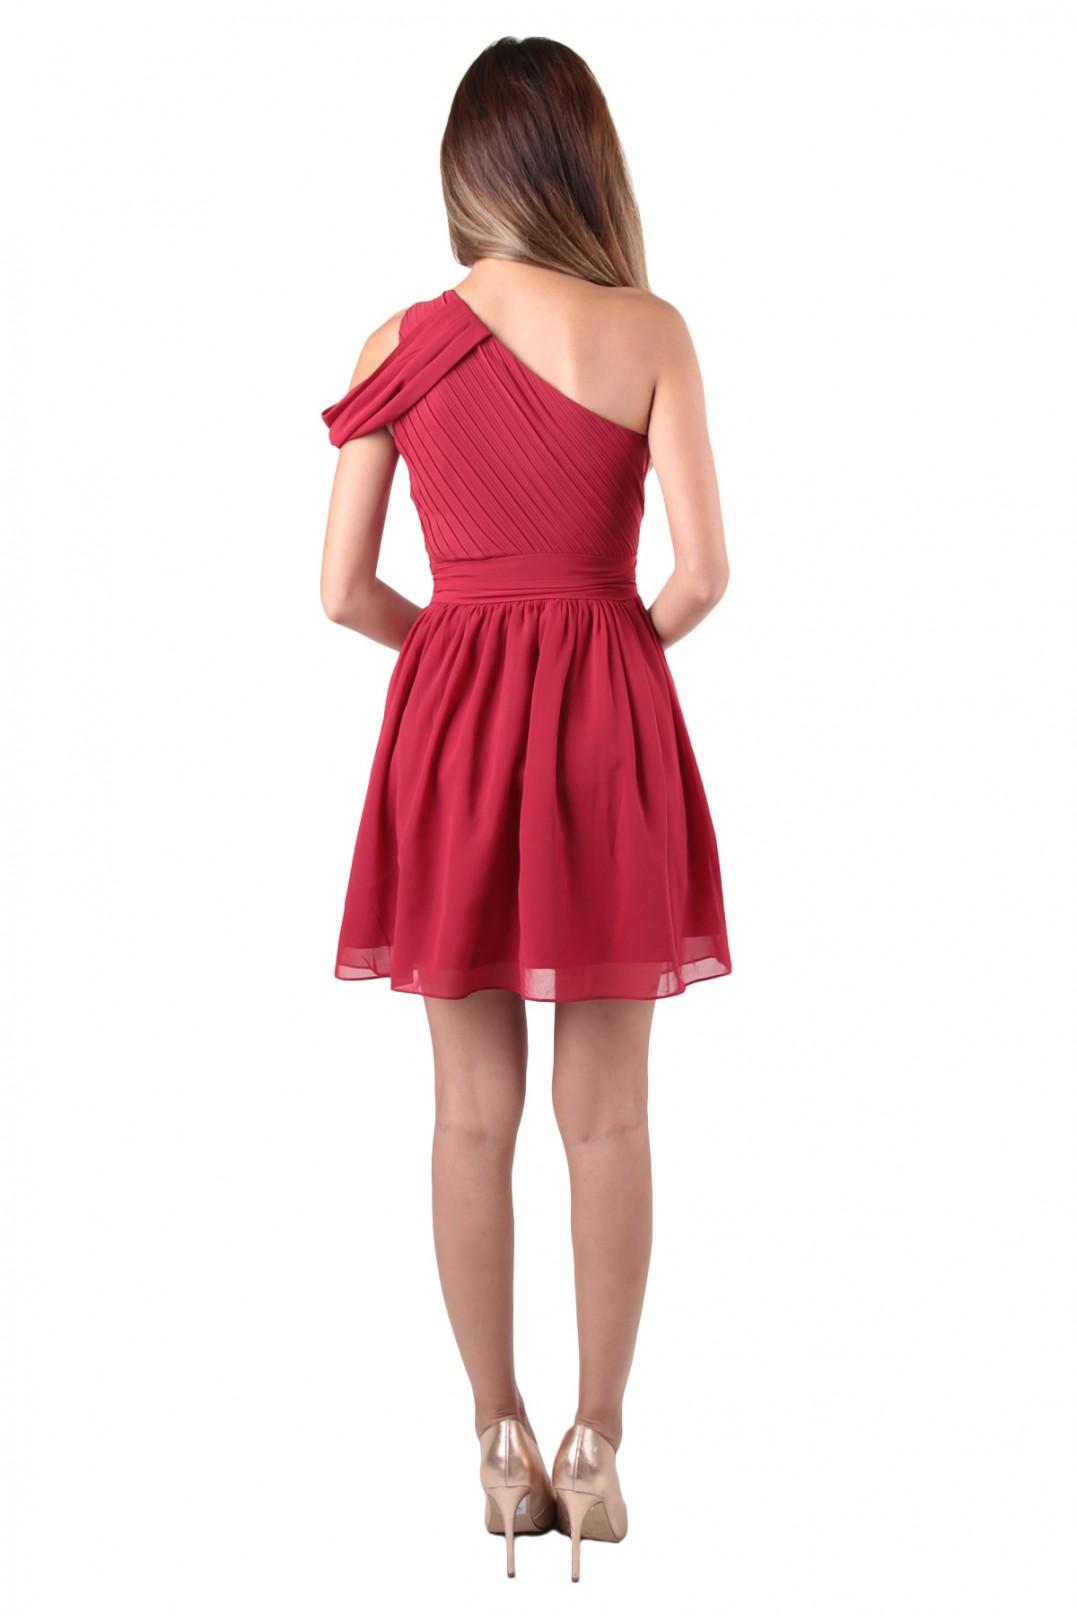 Orange Chiffon Its Fashion Metro Blouses Dark Brown: Quince Toga Dress In Burgundy Red